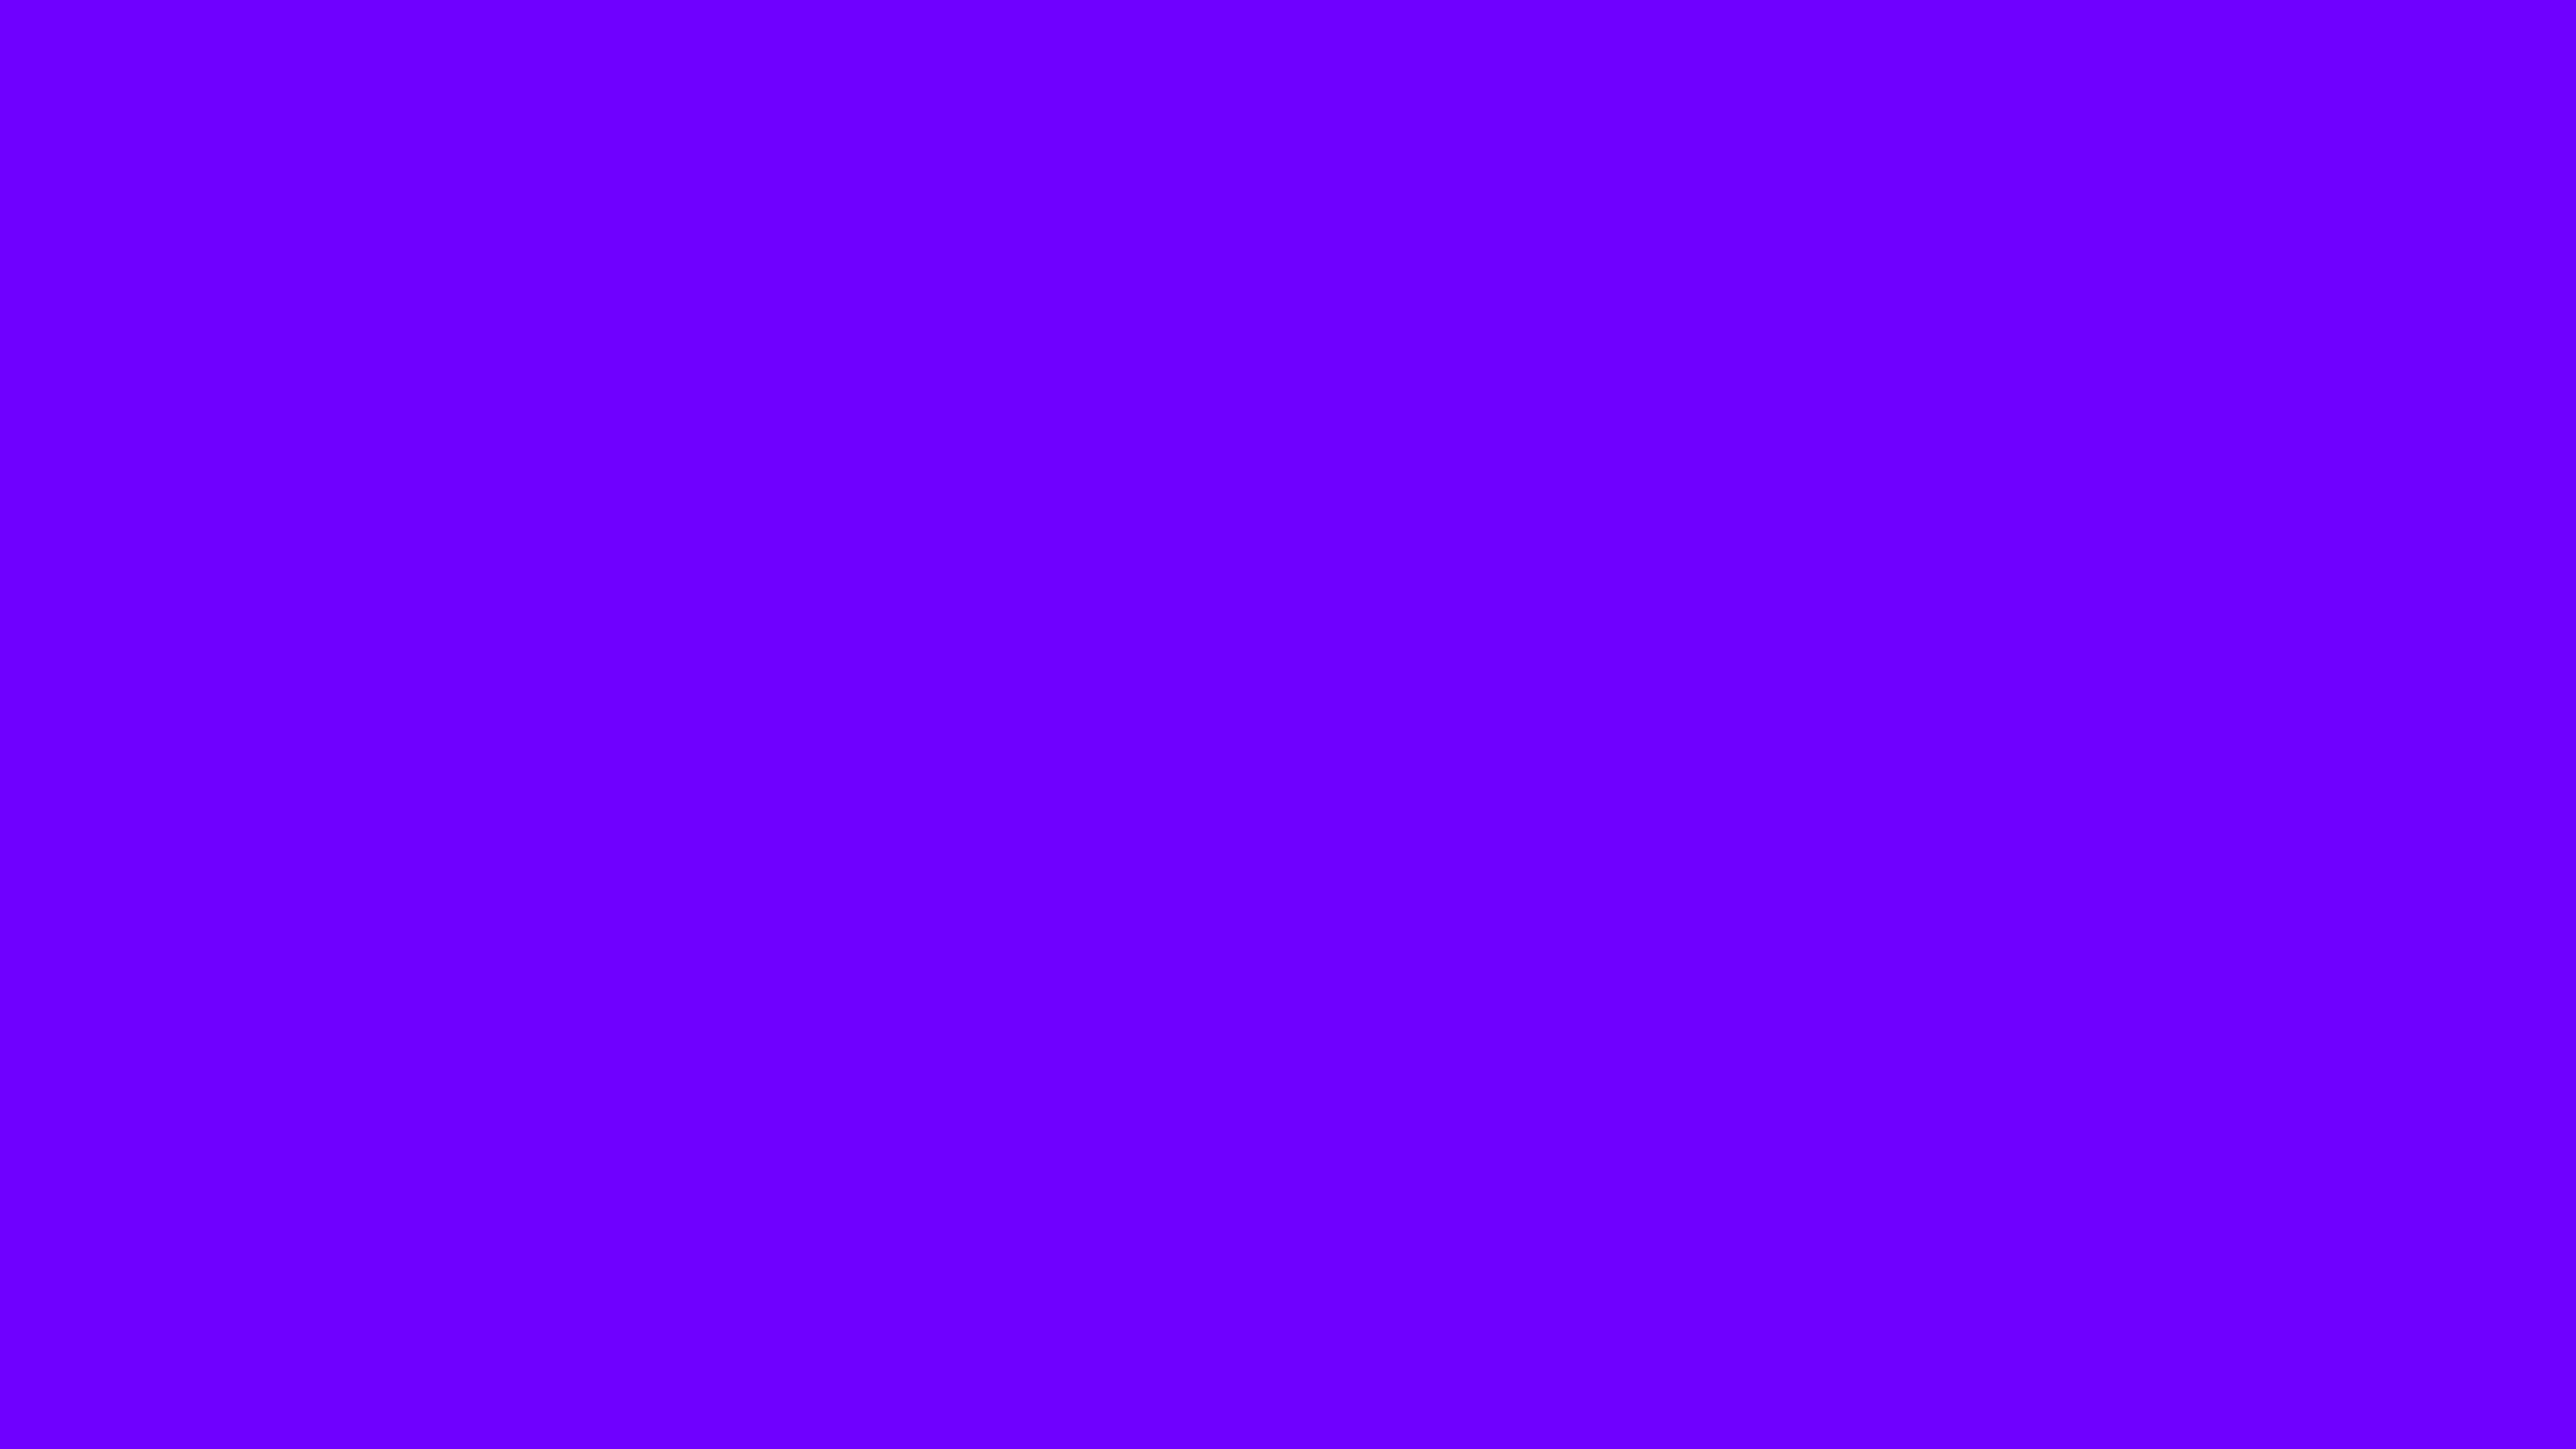 4096x2304 Electric Indigo Solid Color Background